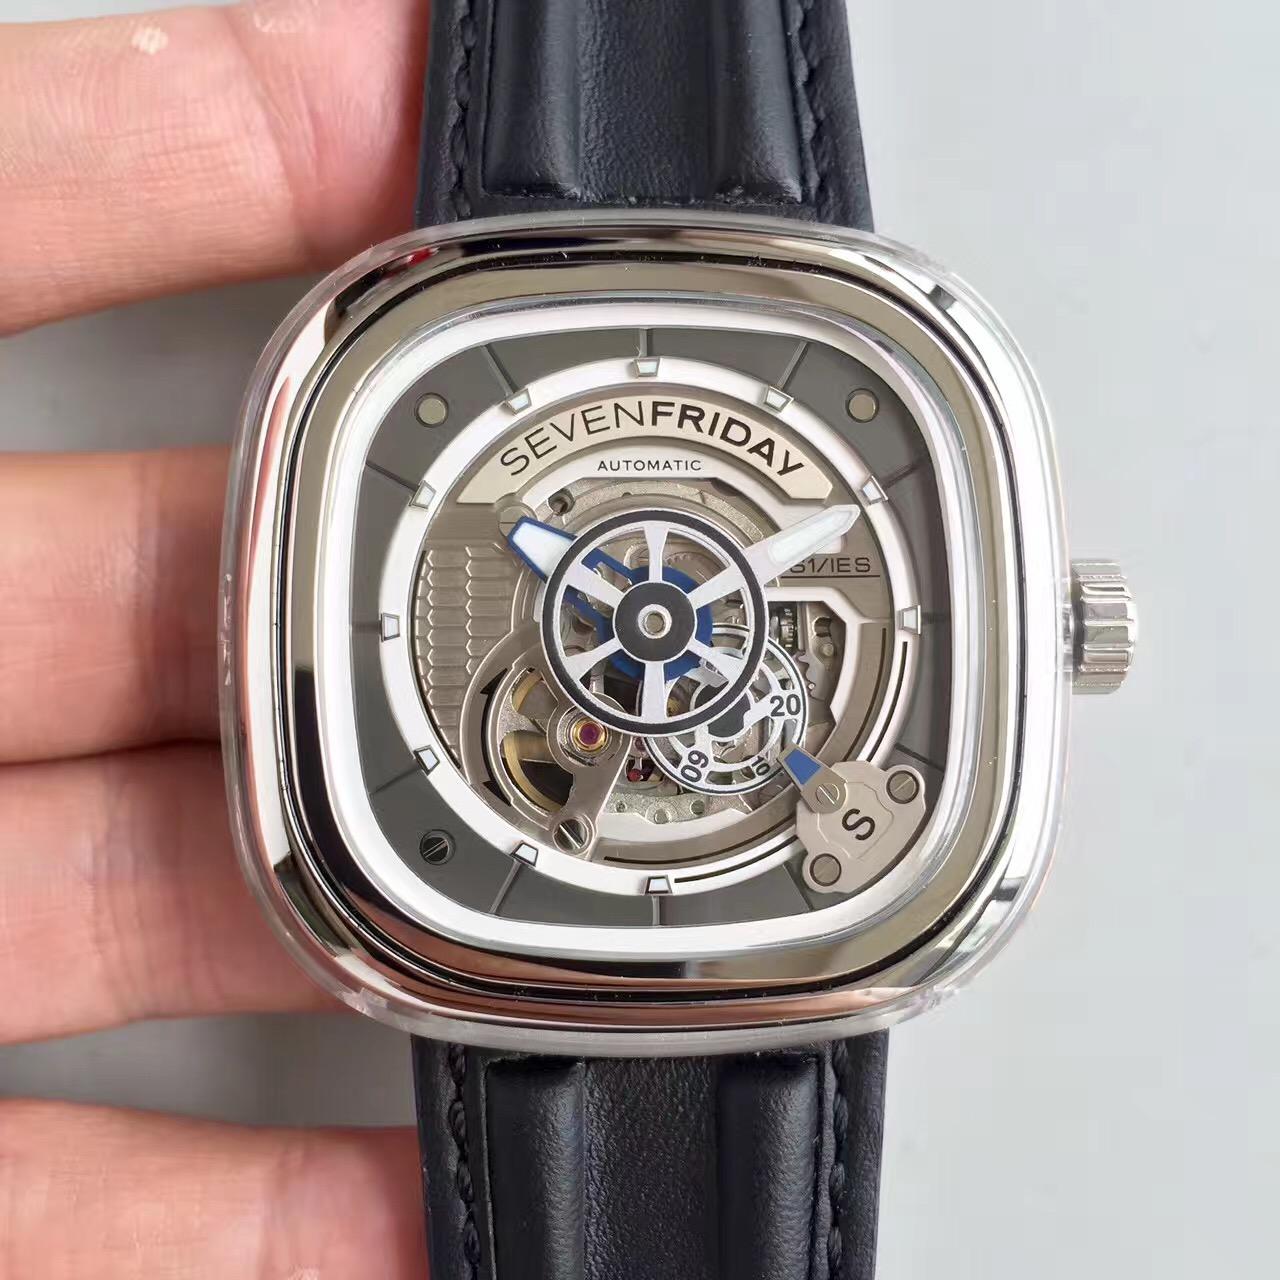 【JL厂】sevenfriday七个星期五S1系列全透明自动机械腕表